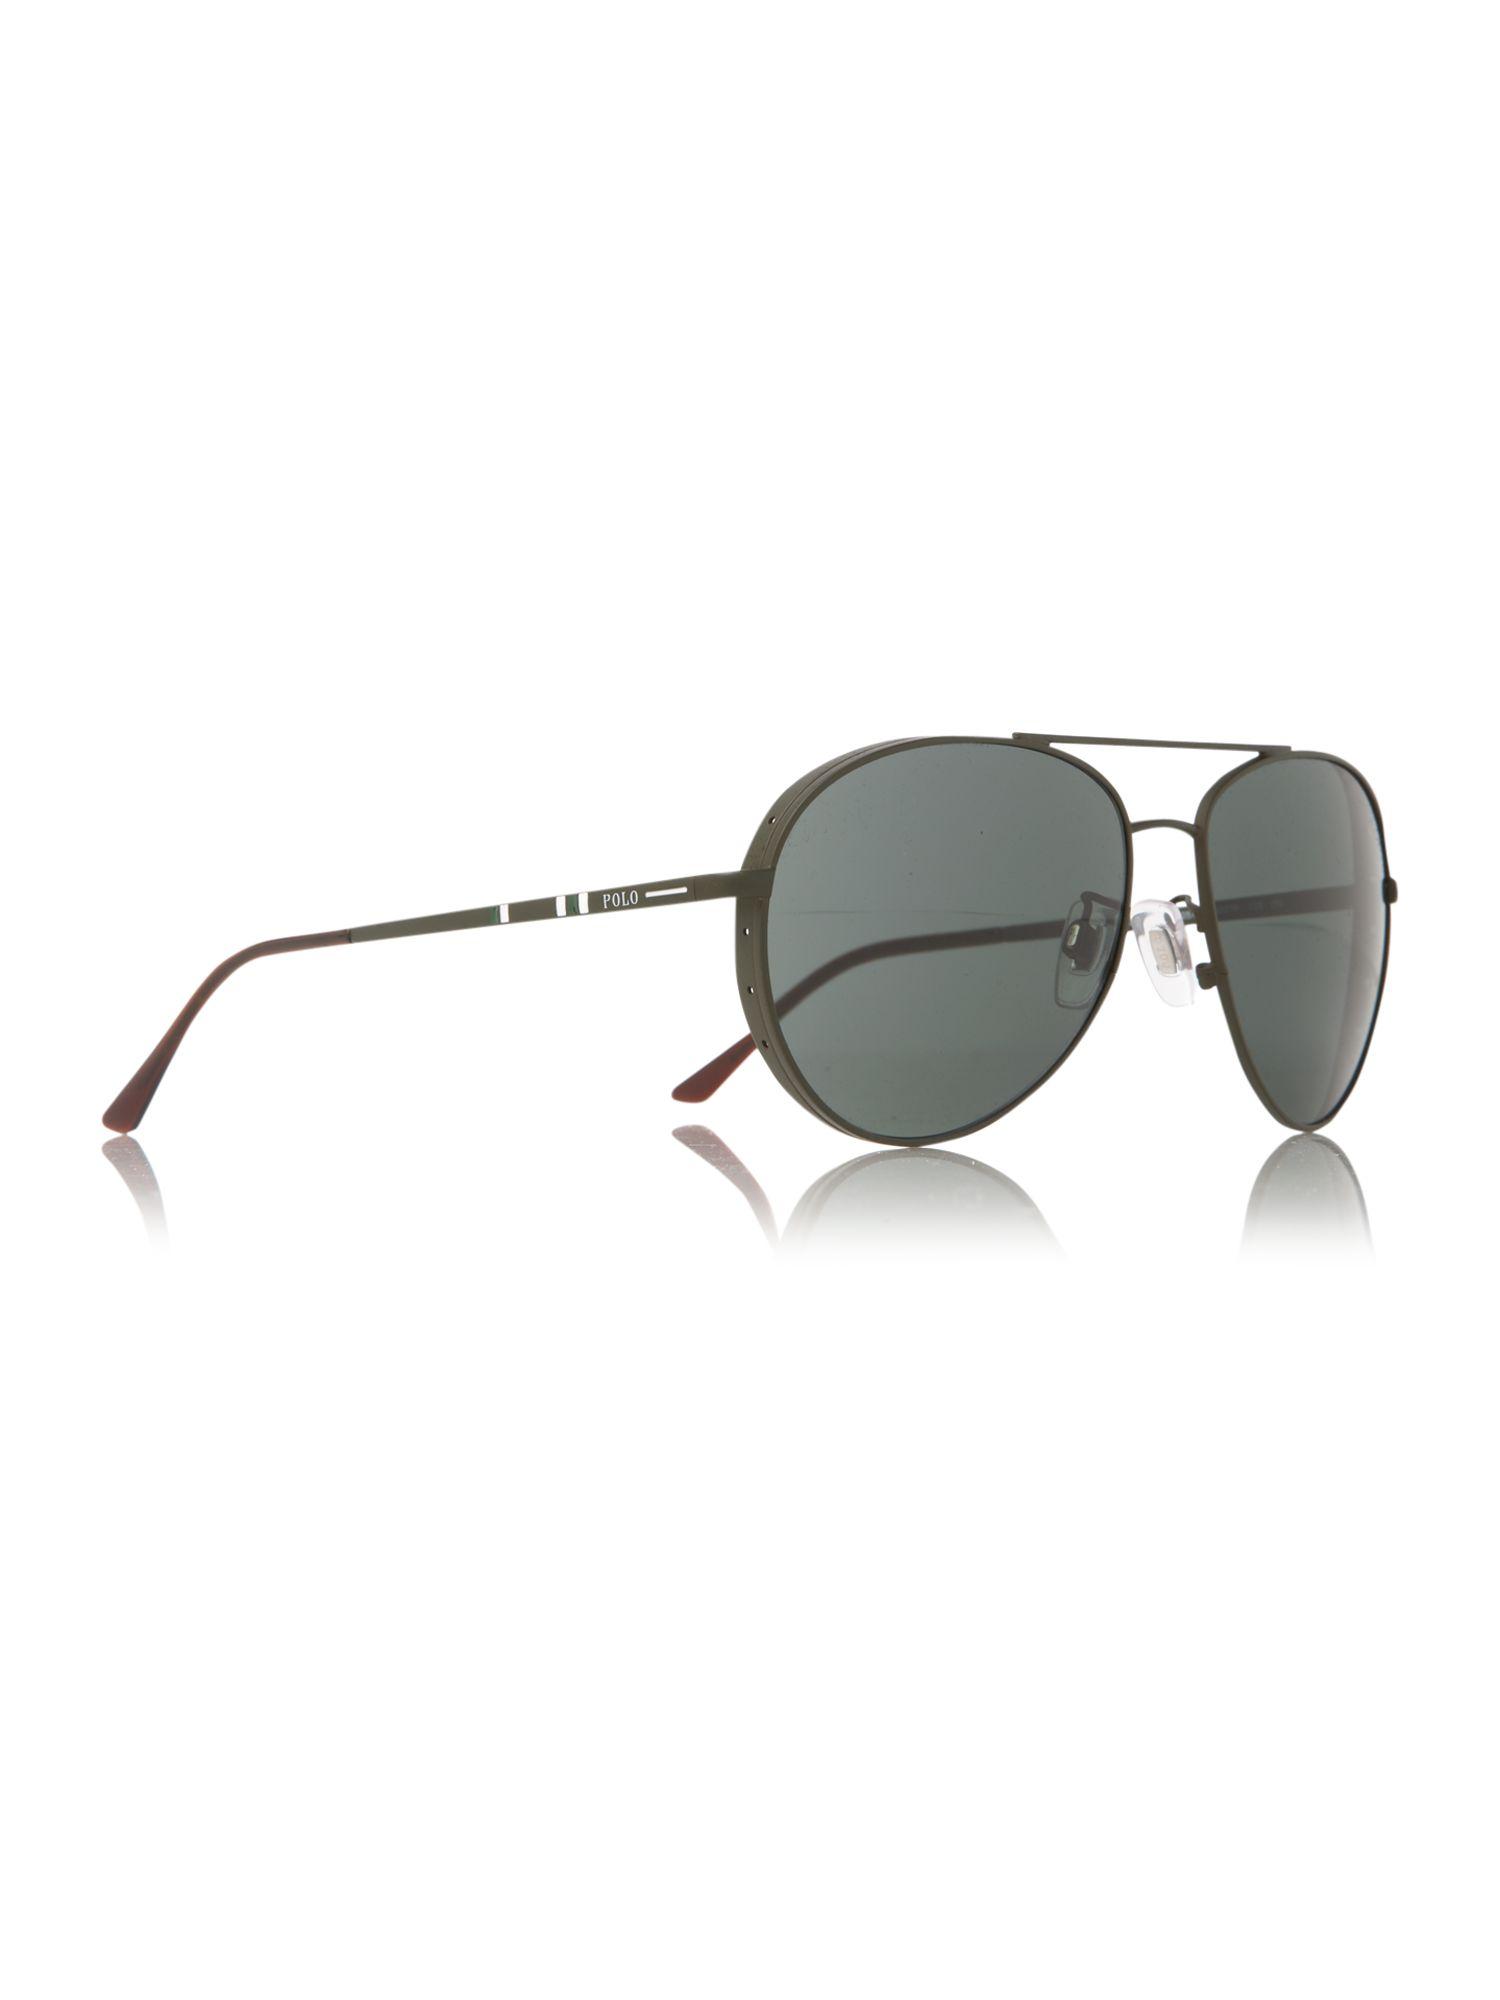 c1ac68f613 Polo Ralph Lauren Sunglasses For Men